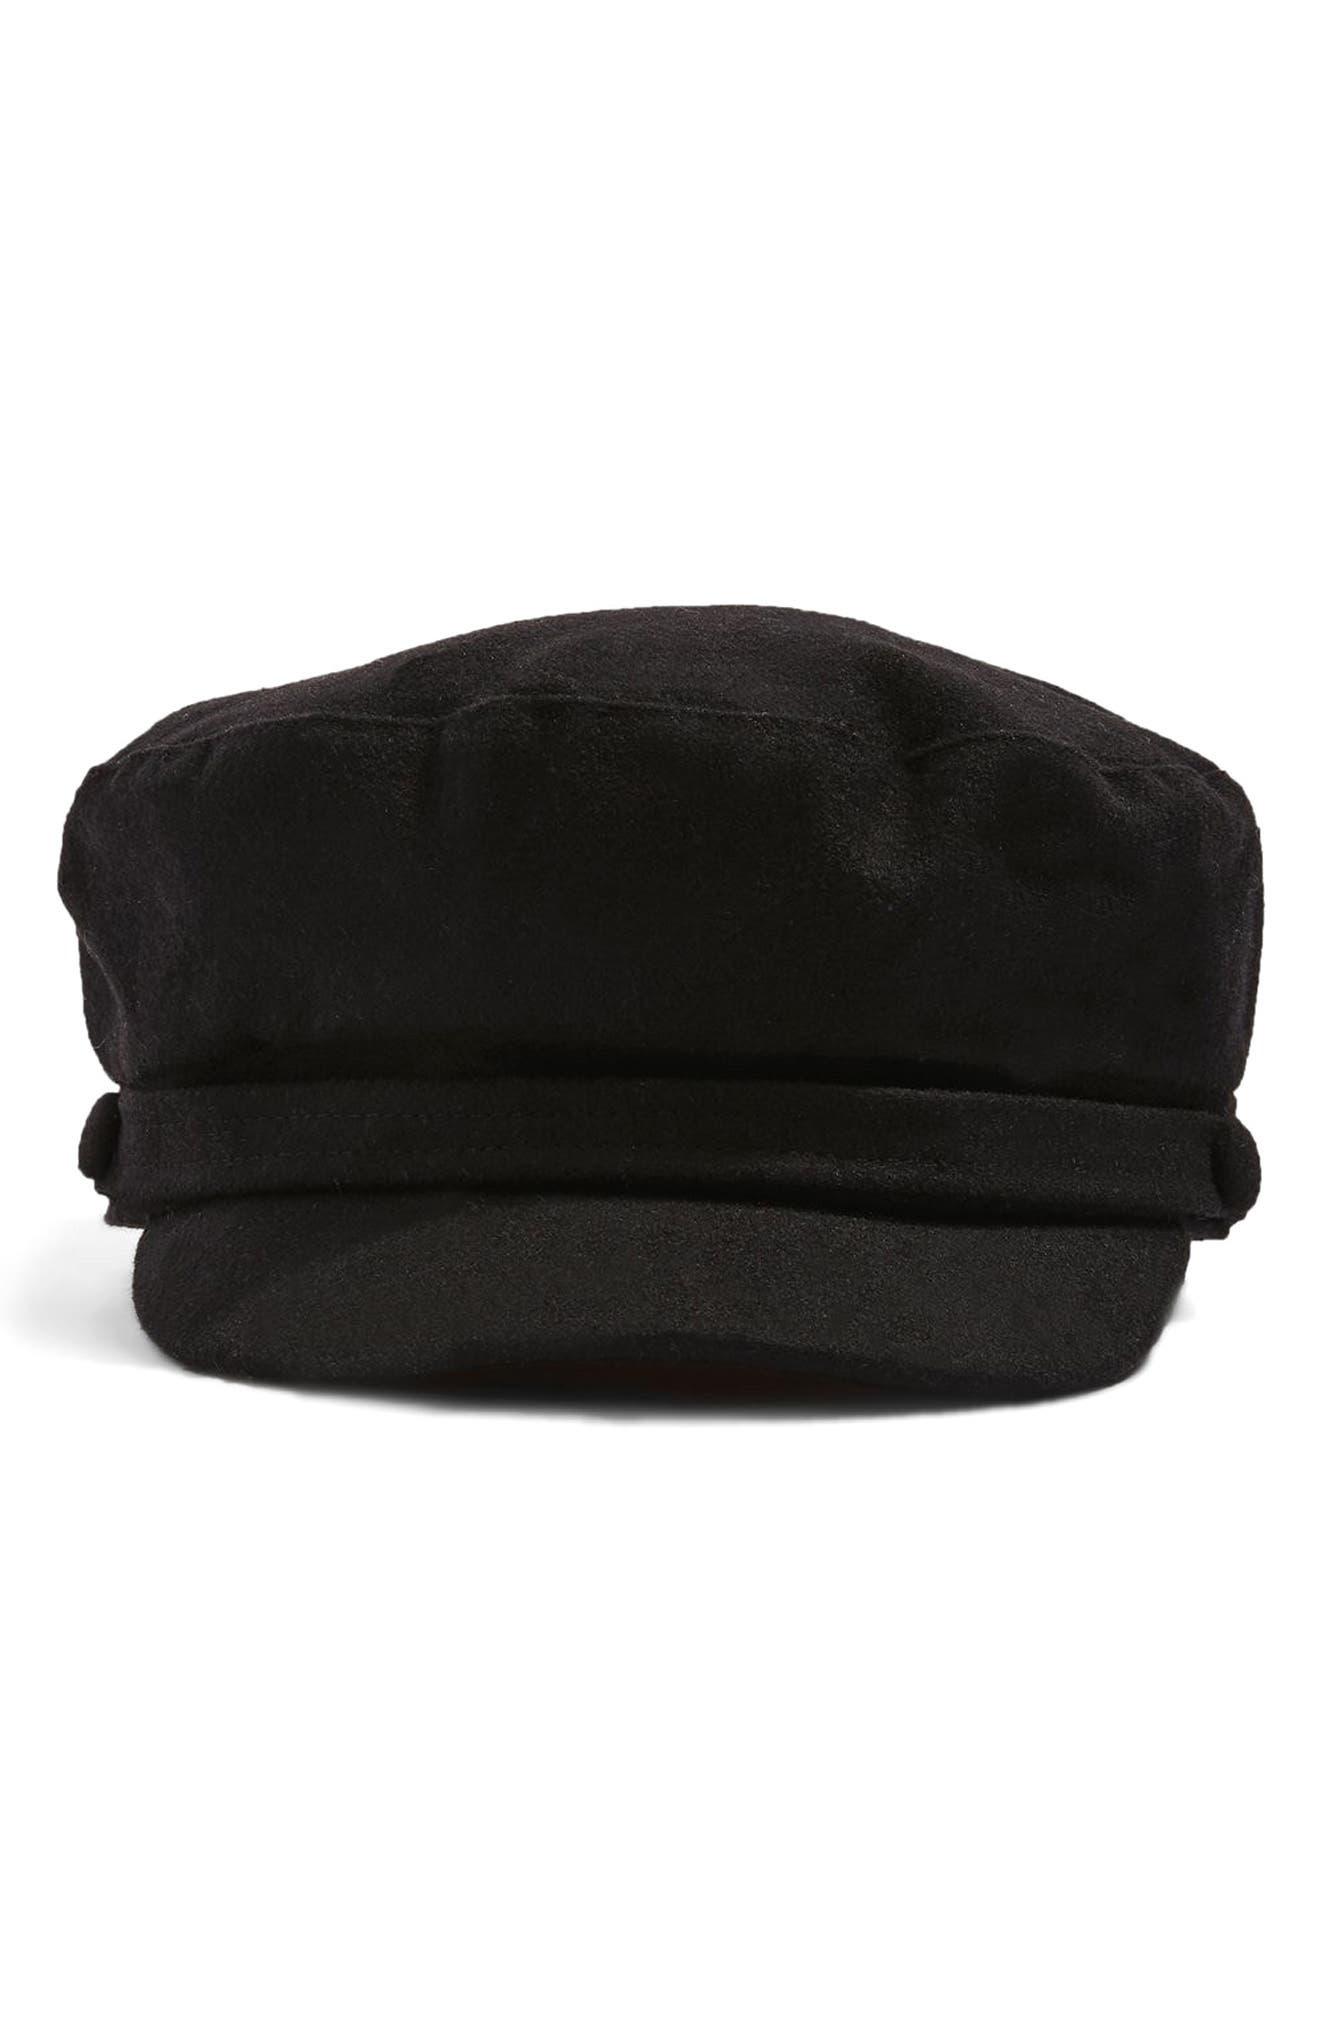 Baker Boy Cap,                         Main,                         color,